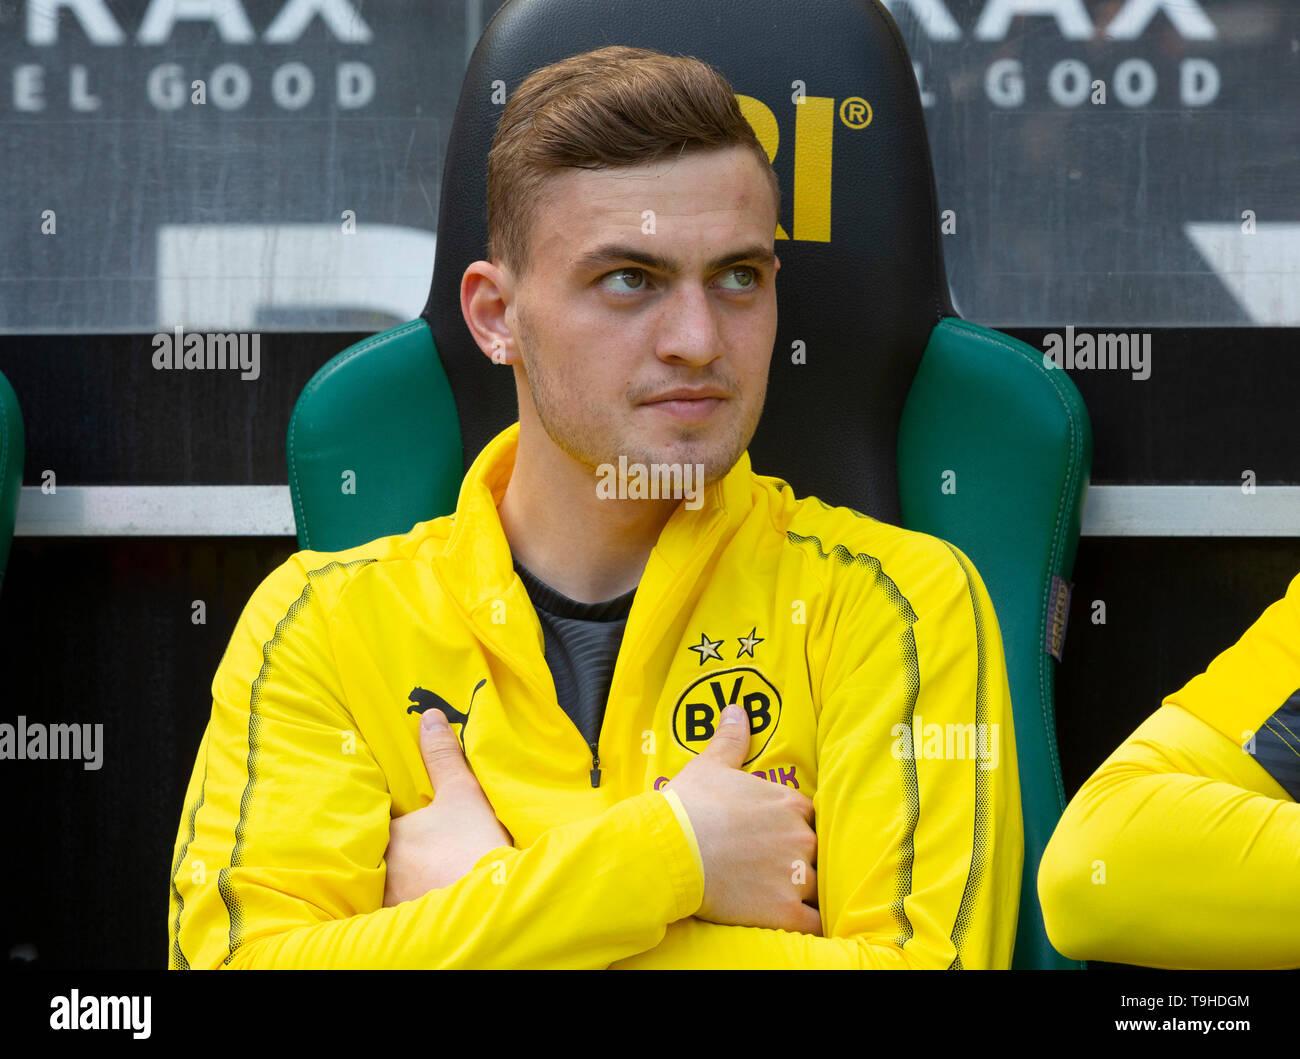 Sport, Fussball, Bundesliga, 2018/2019, Borussia Moenchengladbach vs. BVB Borussia Dortmund 0-2, Stadion Borussia-Park, Spielerbank, Jacob Bruun Larsen (BVB), DFL REGULATIONS PROHIBIT ANY USE OF PHOTOGRAPHS AS IMAGE SEQUENCES AND/OR QUASI-VIDEO, sports, football, Bundesliga, 2018/2019, Borussia Moenchengladbach vs. BVB Borussia Dortmund 0-2, Stadium Borussia Park, players bench, Jacob Bruun Larsen (BVB), DFL REGULATIONS PROHIBIT ANY USE OF PHOTOGRAPHS AS IMAGE SEQUENCES AND/OR QUASI-VIDEO *** Local Caption *** sports, football, Bundesliga, 2018/2019, Borussia Moenchengladbach vs. BVB Borussia  - Stock Image